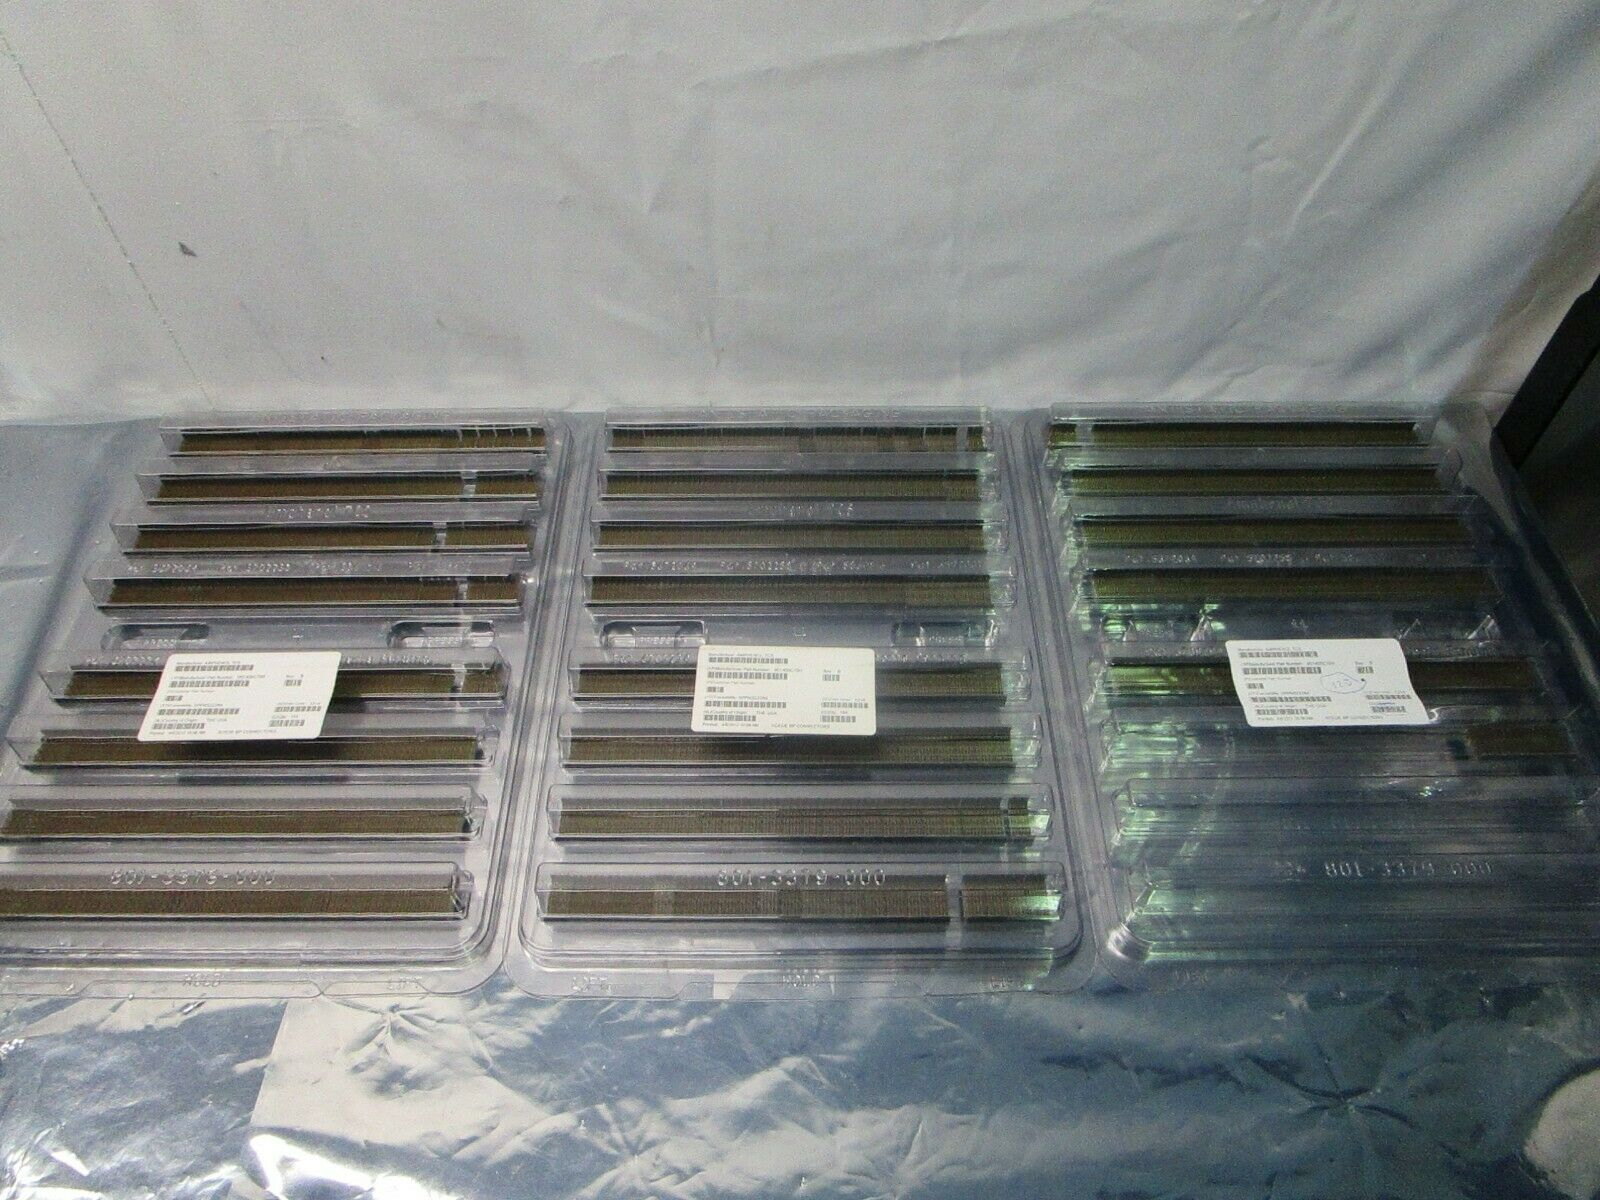 1 Lot of 532 Amphenol TCS 951-400C-70H Xcede Backplane Connectors, 102323